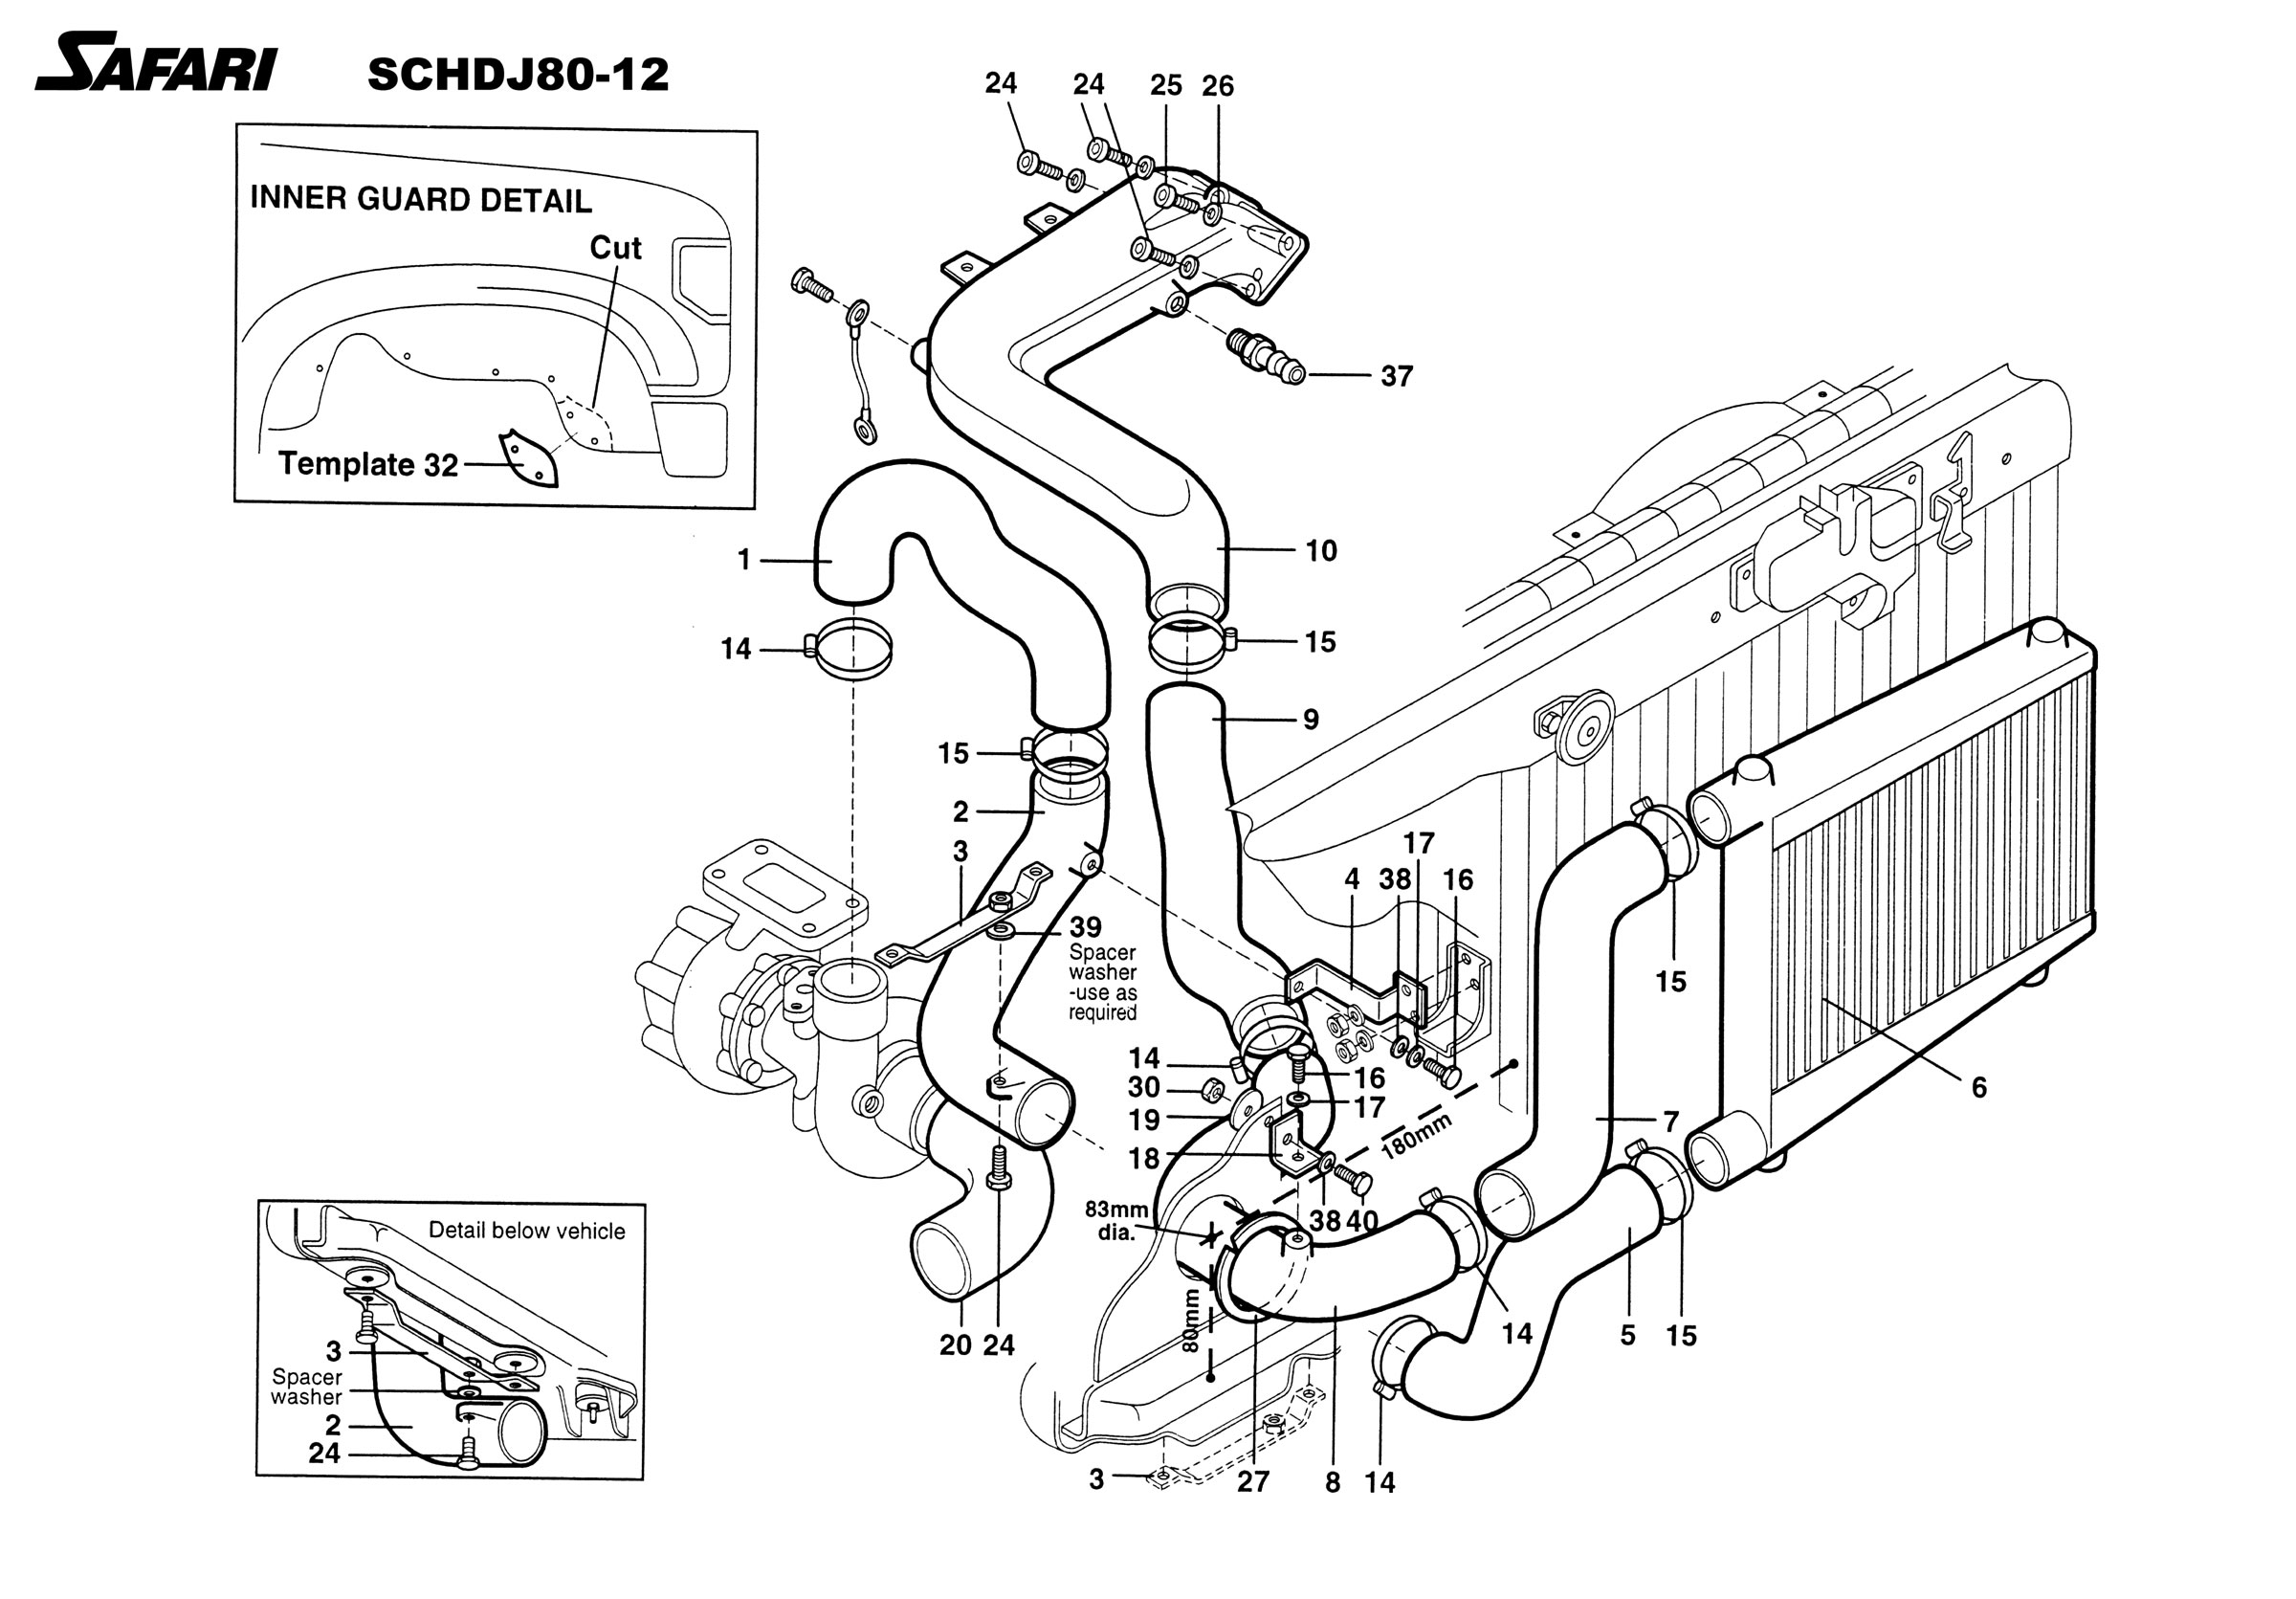 toyota fj40 wiring diagram open source safari diesel intercooler system for the land cruiser hdj80 80 series factory turbo 1hd t engine